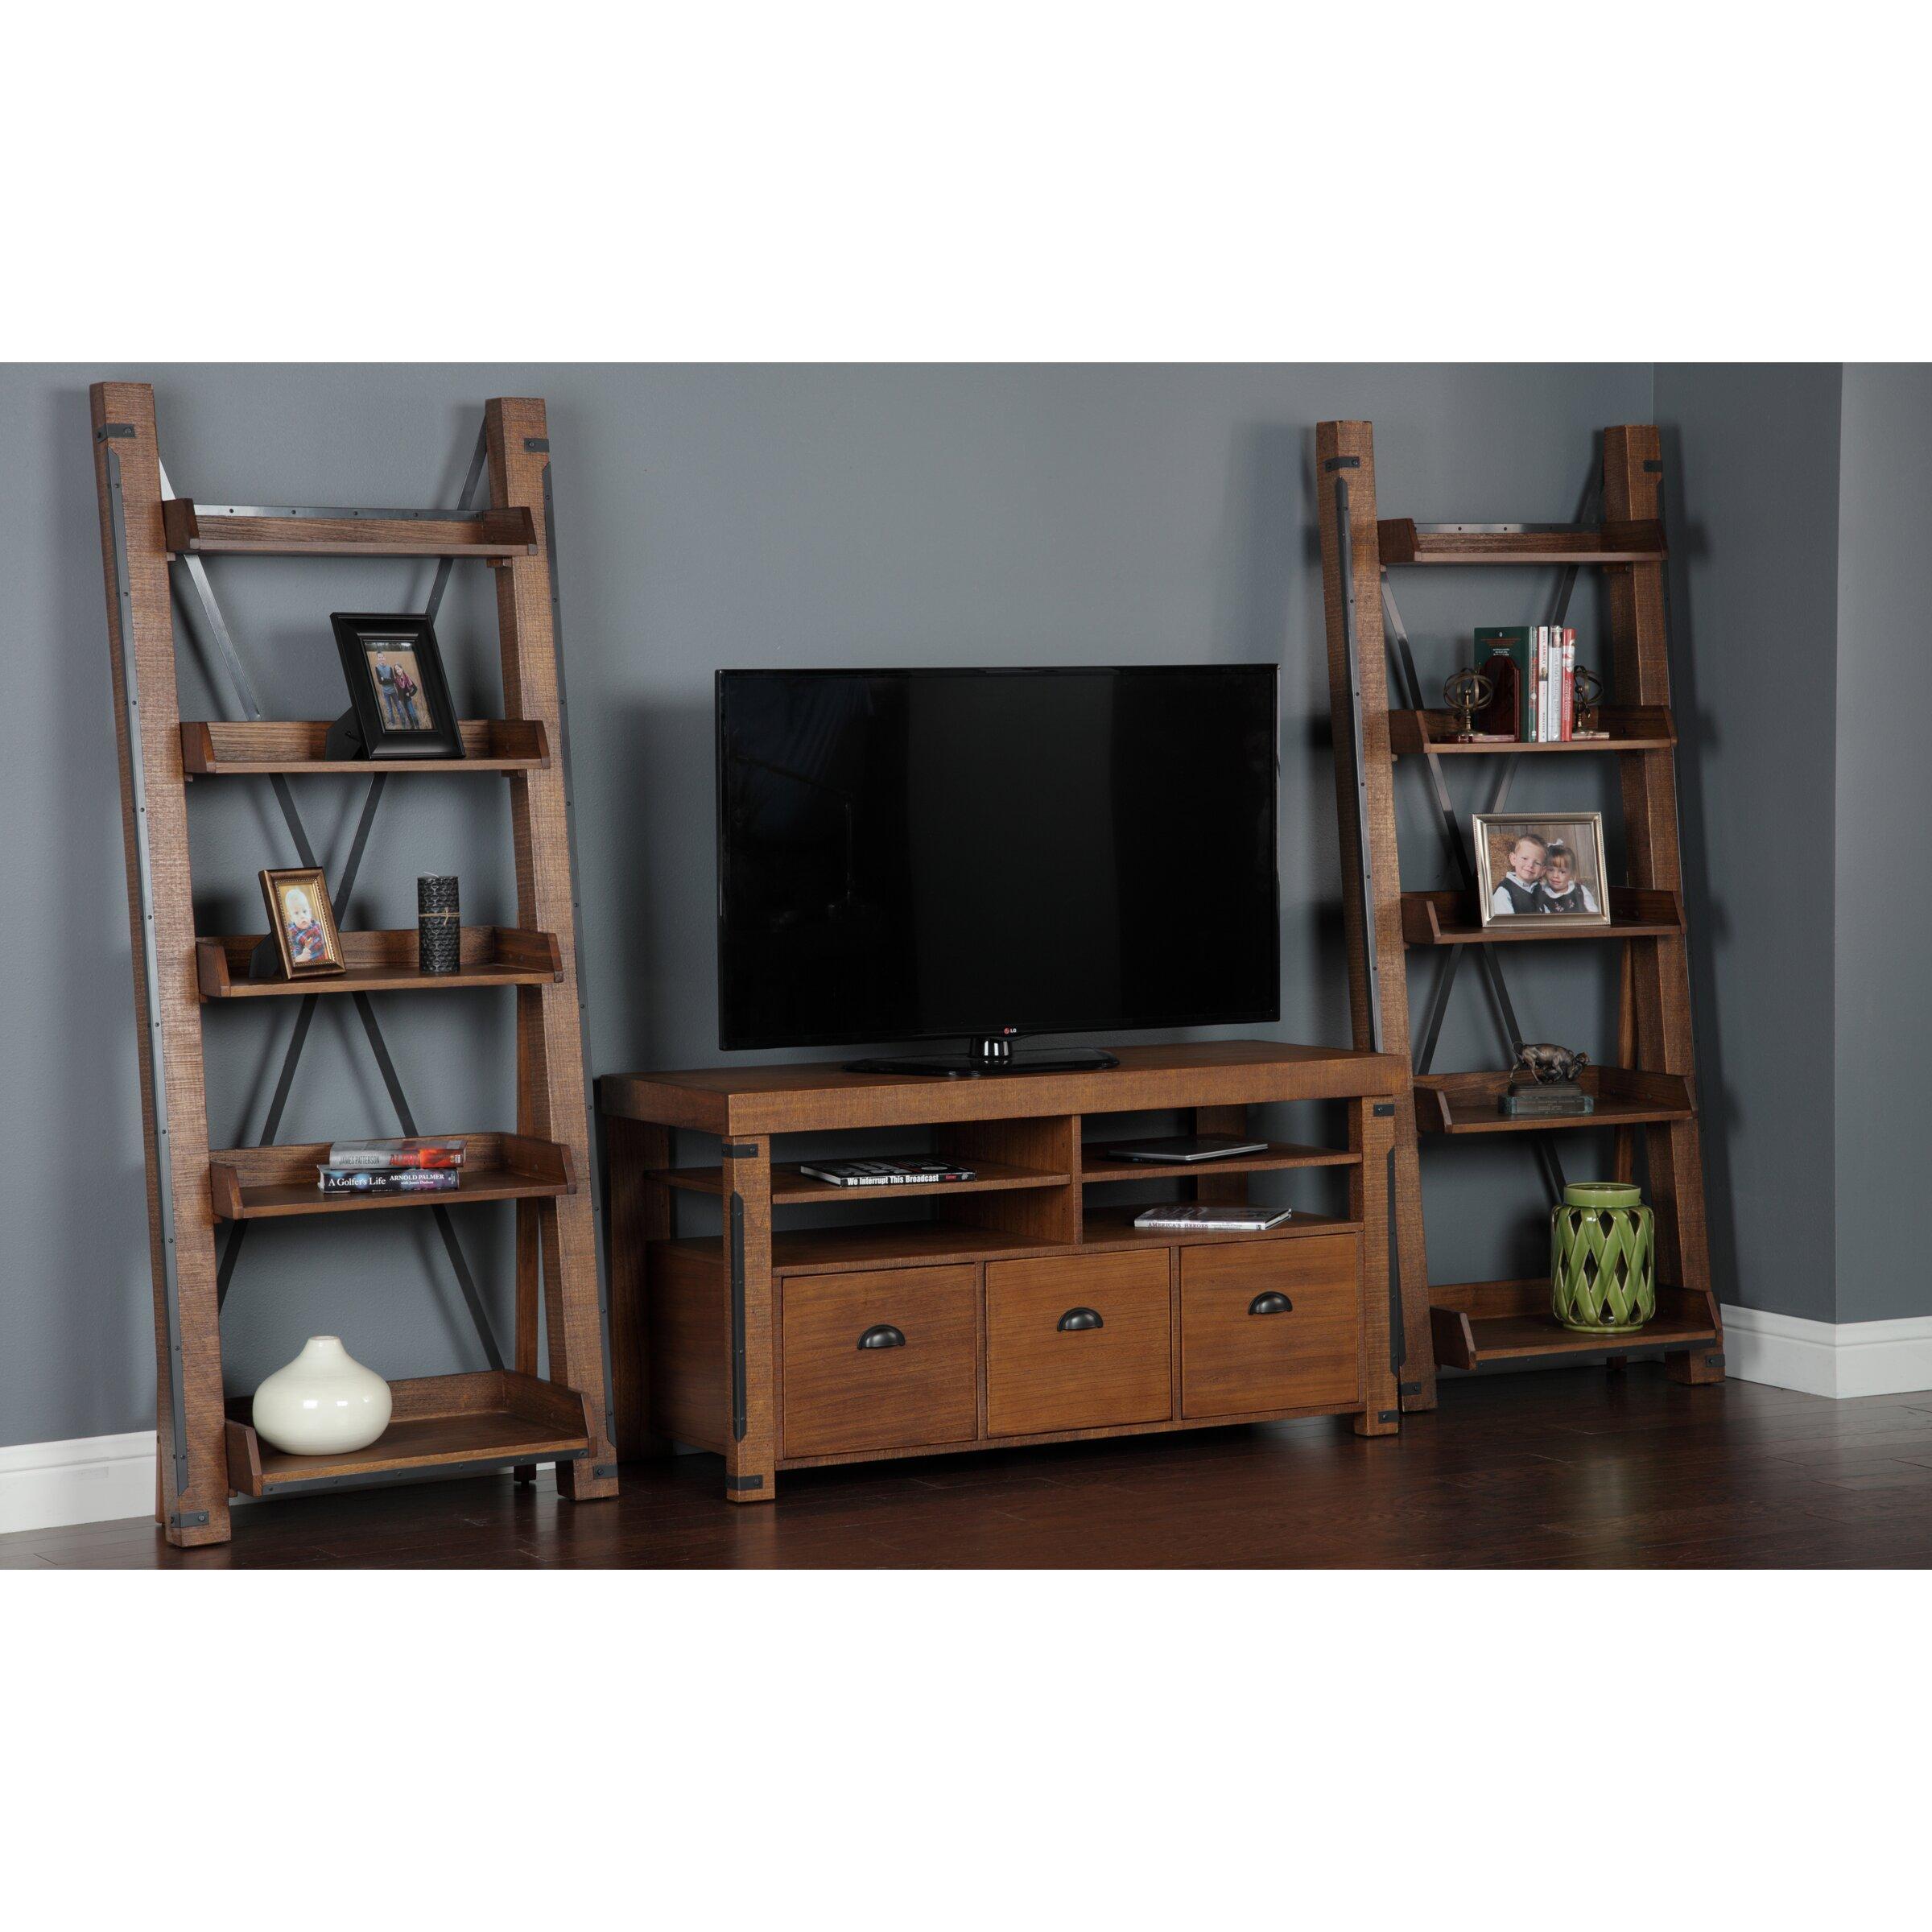 "American Furniture Classics Industrial 81"" Leaning"